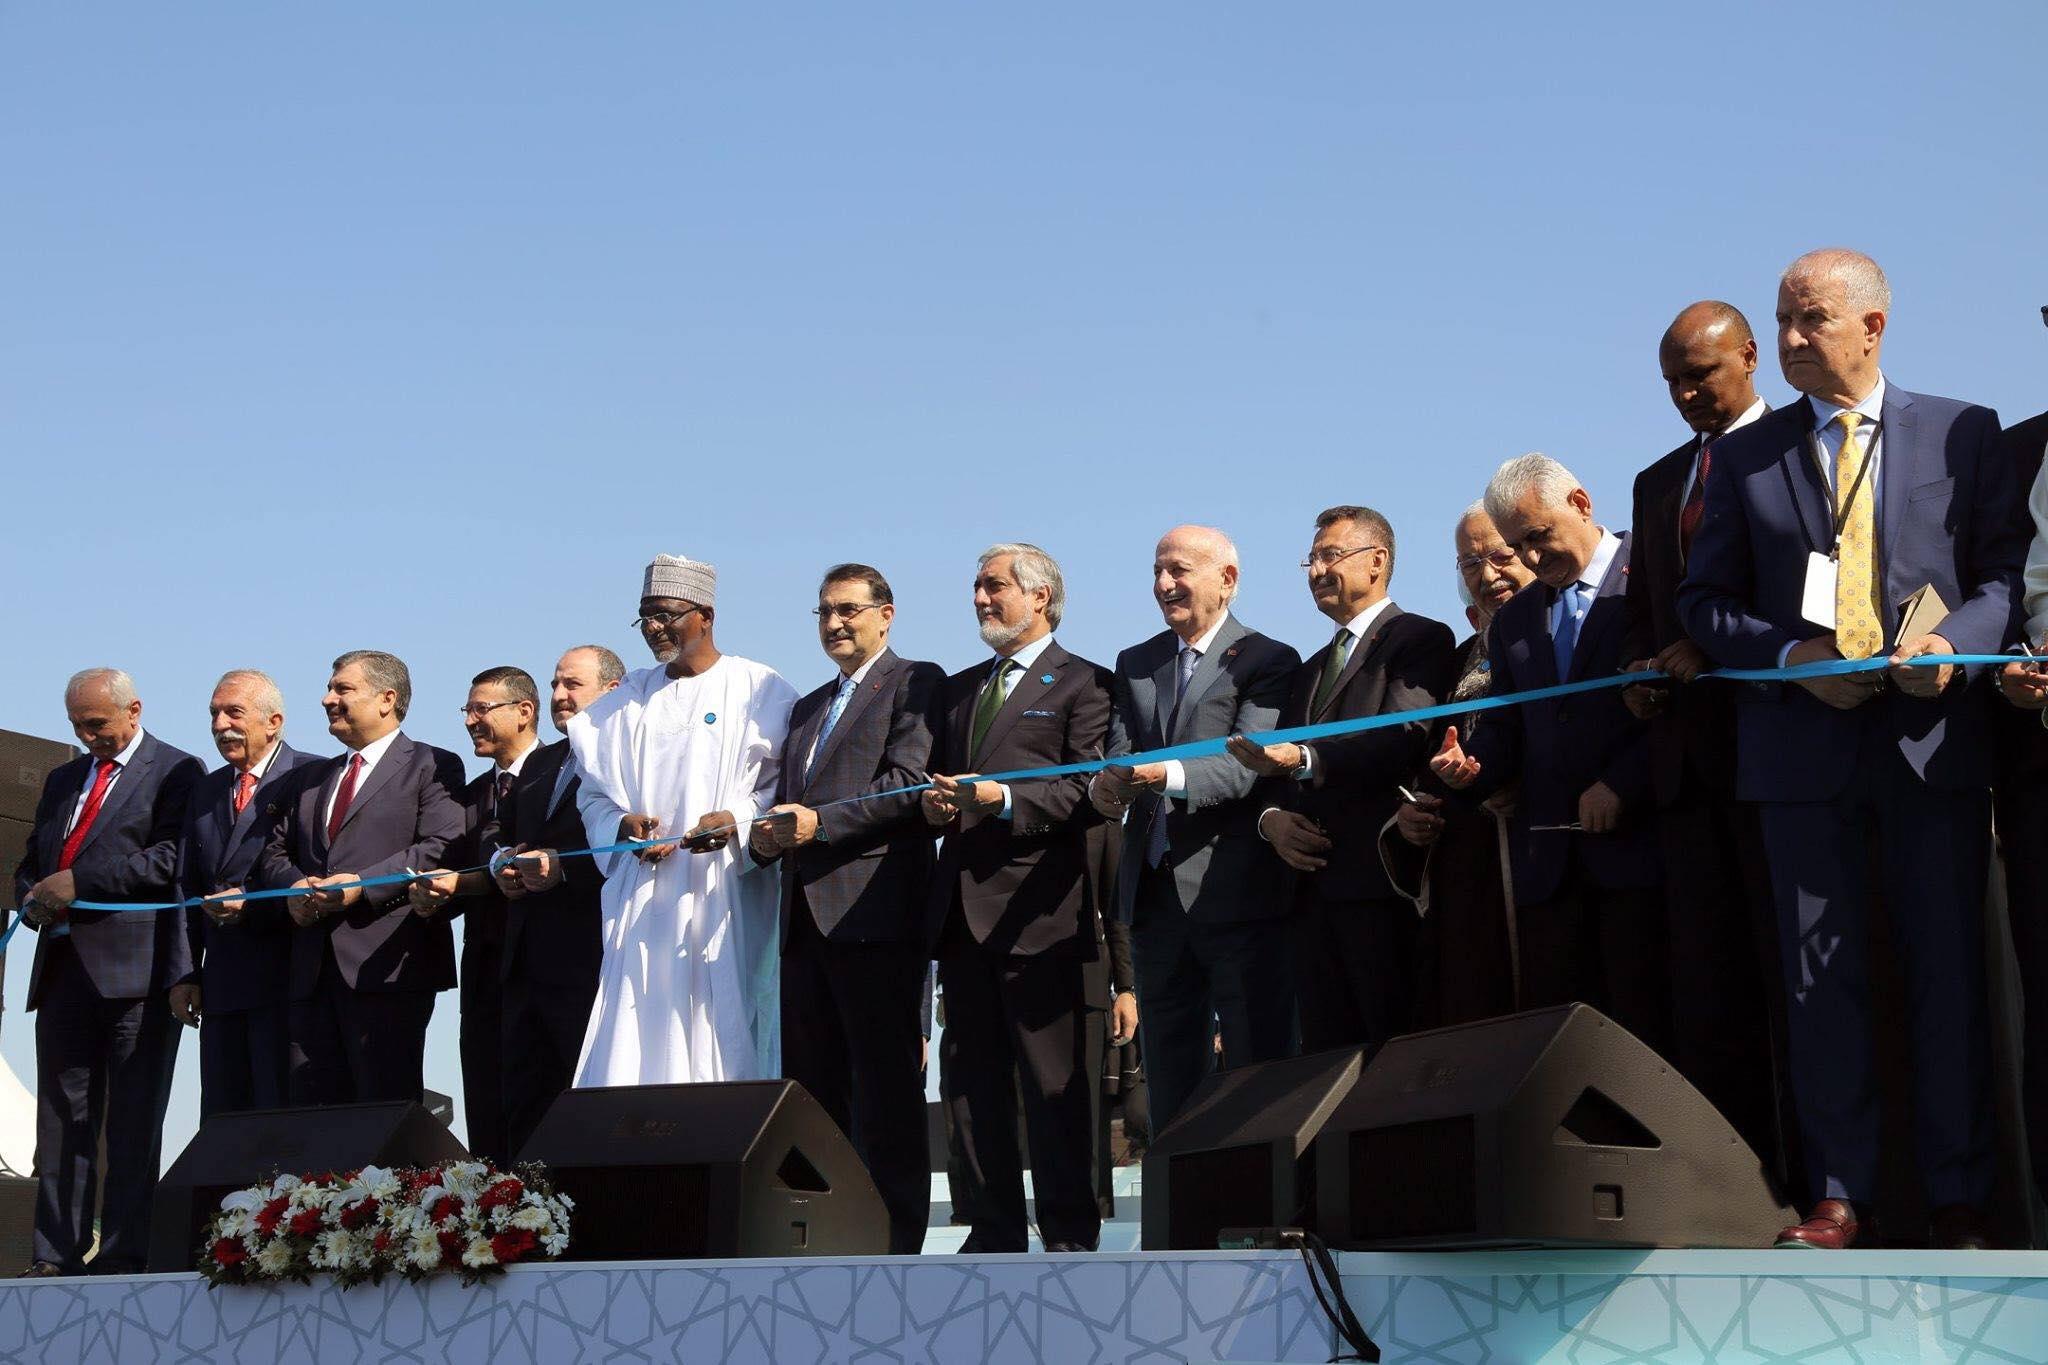 پذيرائى از جانب جلالتمأب فوات اوكتاى، معاون رئيس جمهور تركيه به مراسم افتتاح رسمى مسجد جامع چامليجا